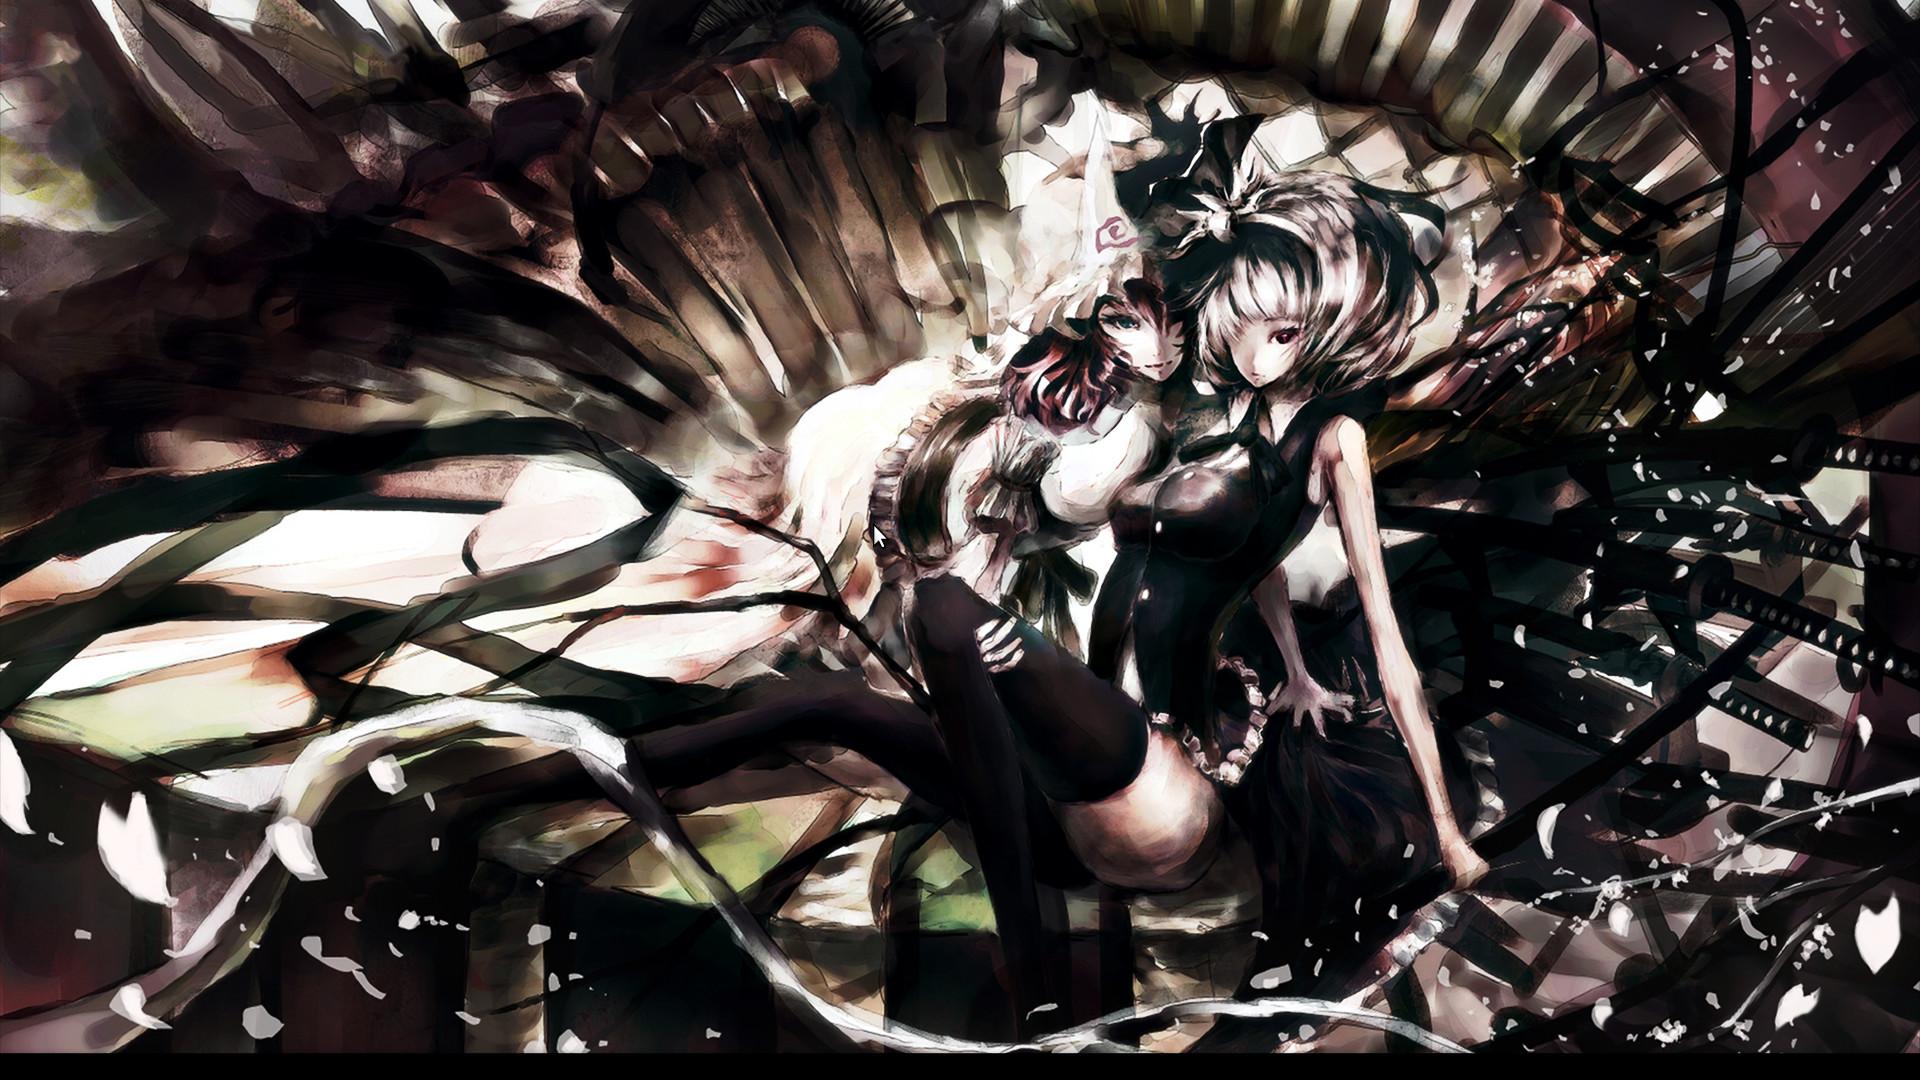 Anime – Touhou Youmu Konpaku Yuyuko Saigyouji Bakgrund